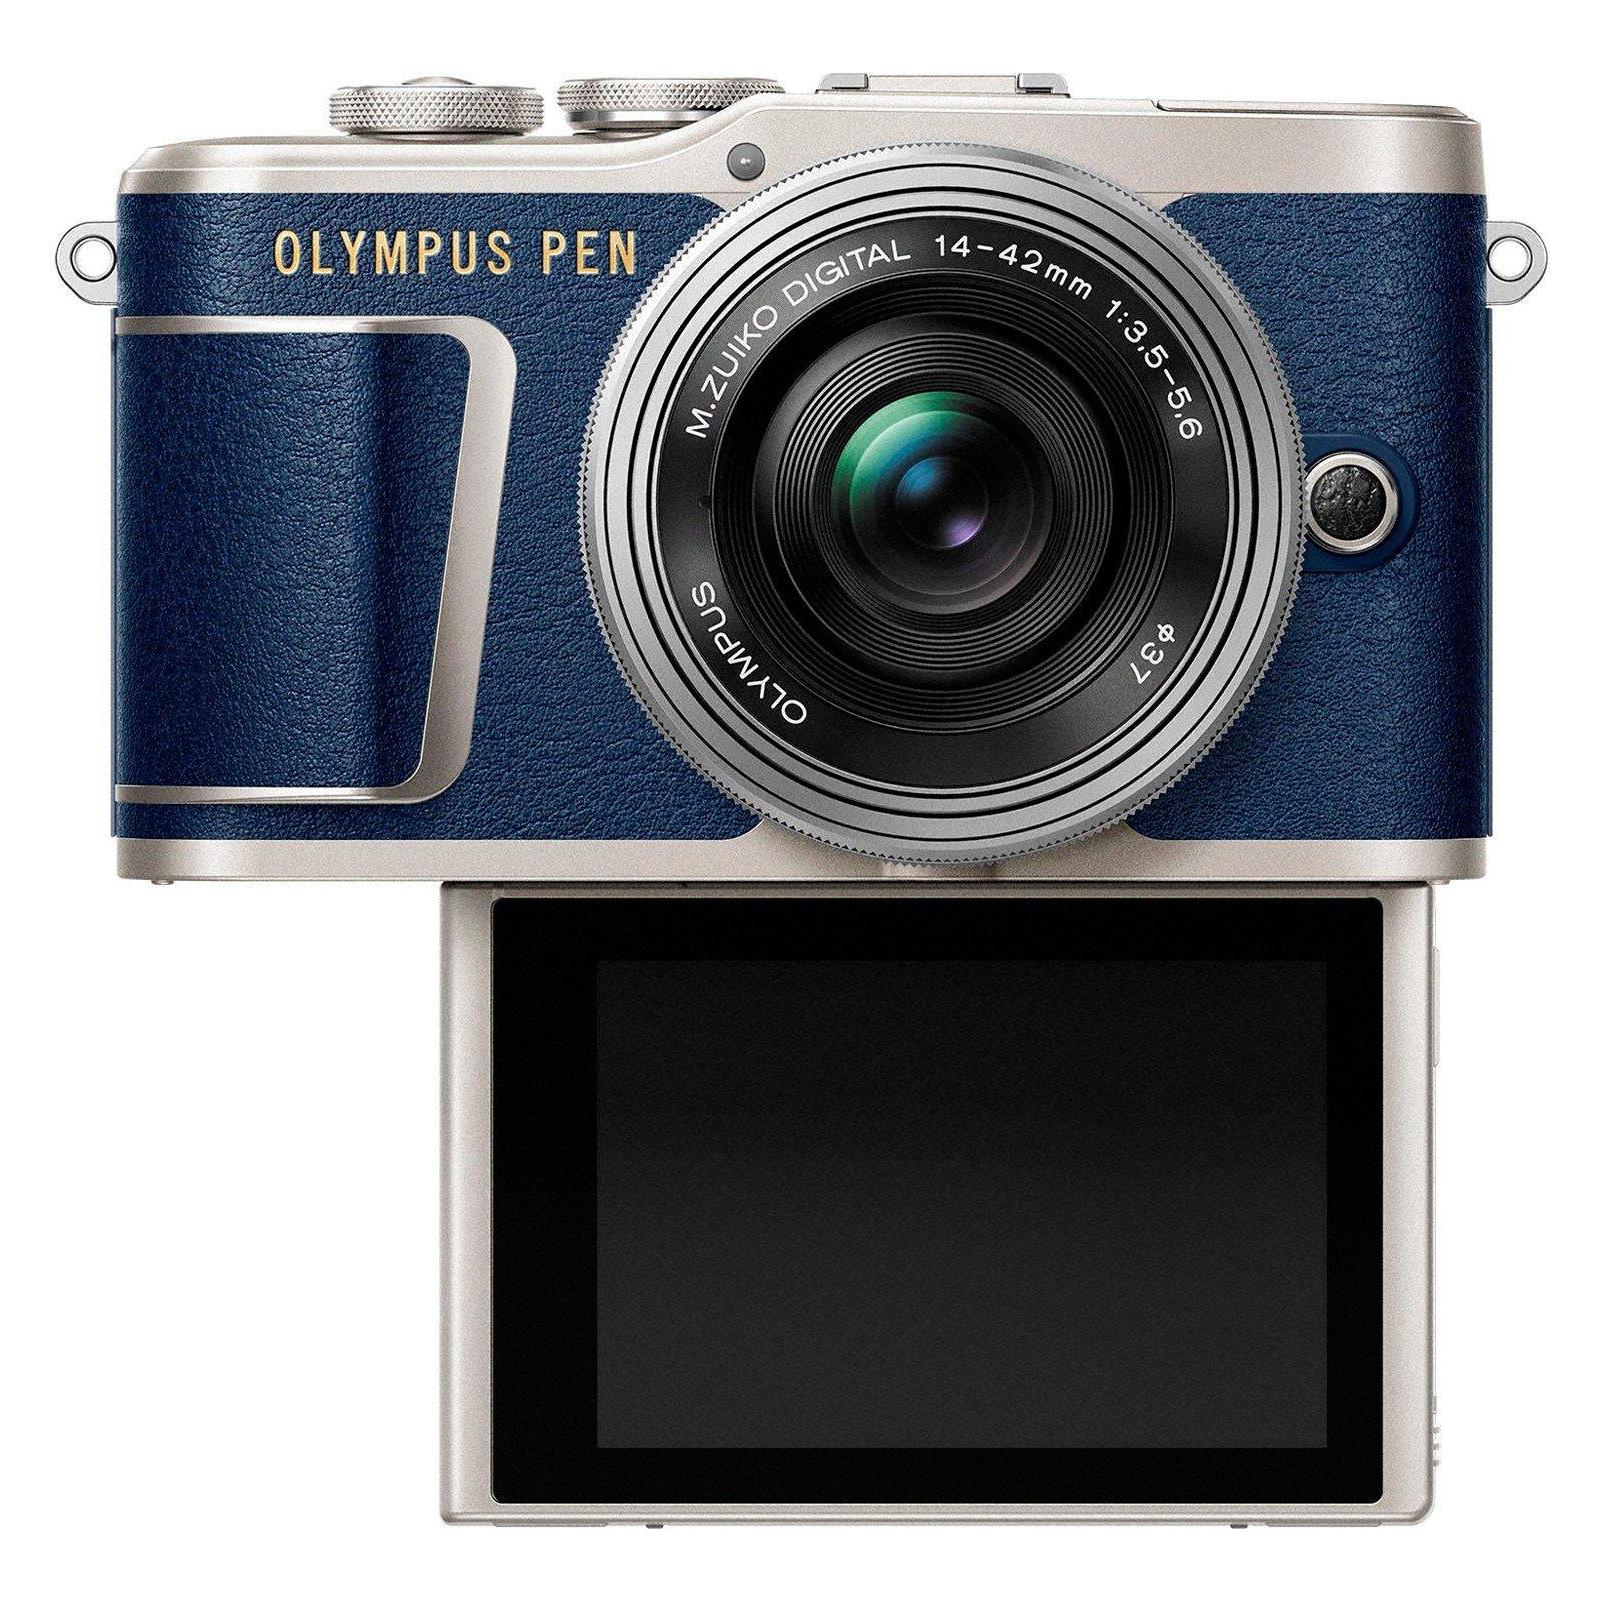 Цифровой фотоаппарат OLYMPUS E-PL9 14-42 mm Pancake Zoom Kit blue/silver (V205092UE000) изображение 6